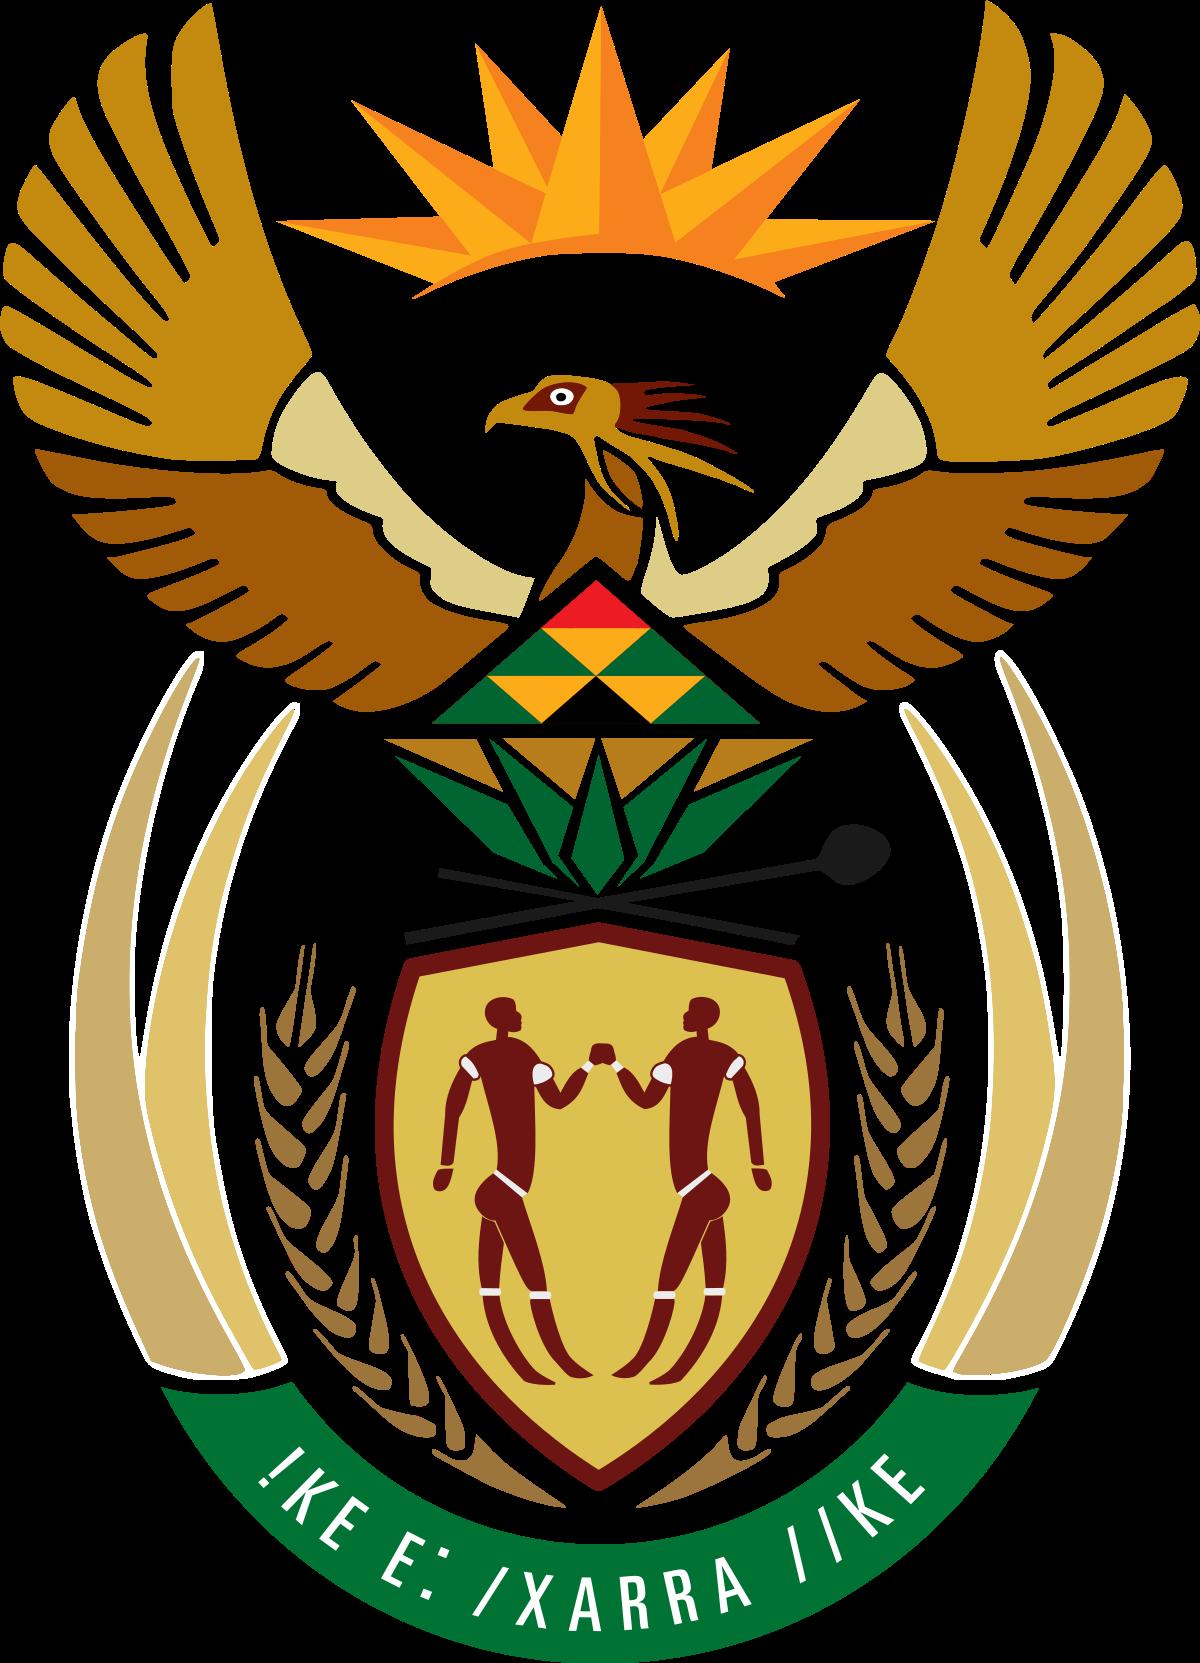 What animal symbolises south australia on the australian coat of arms